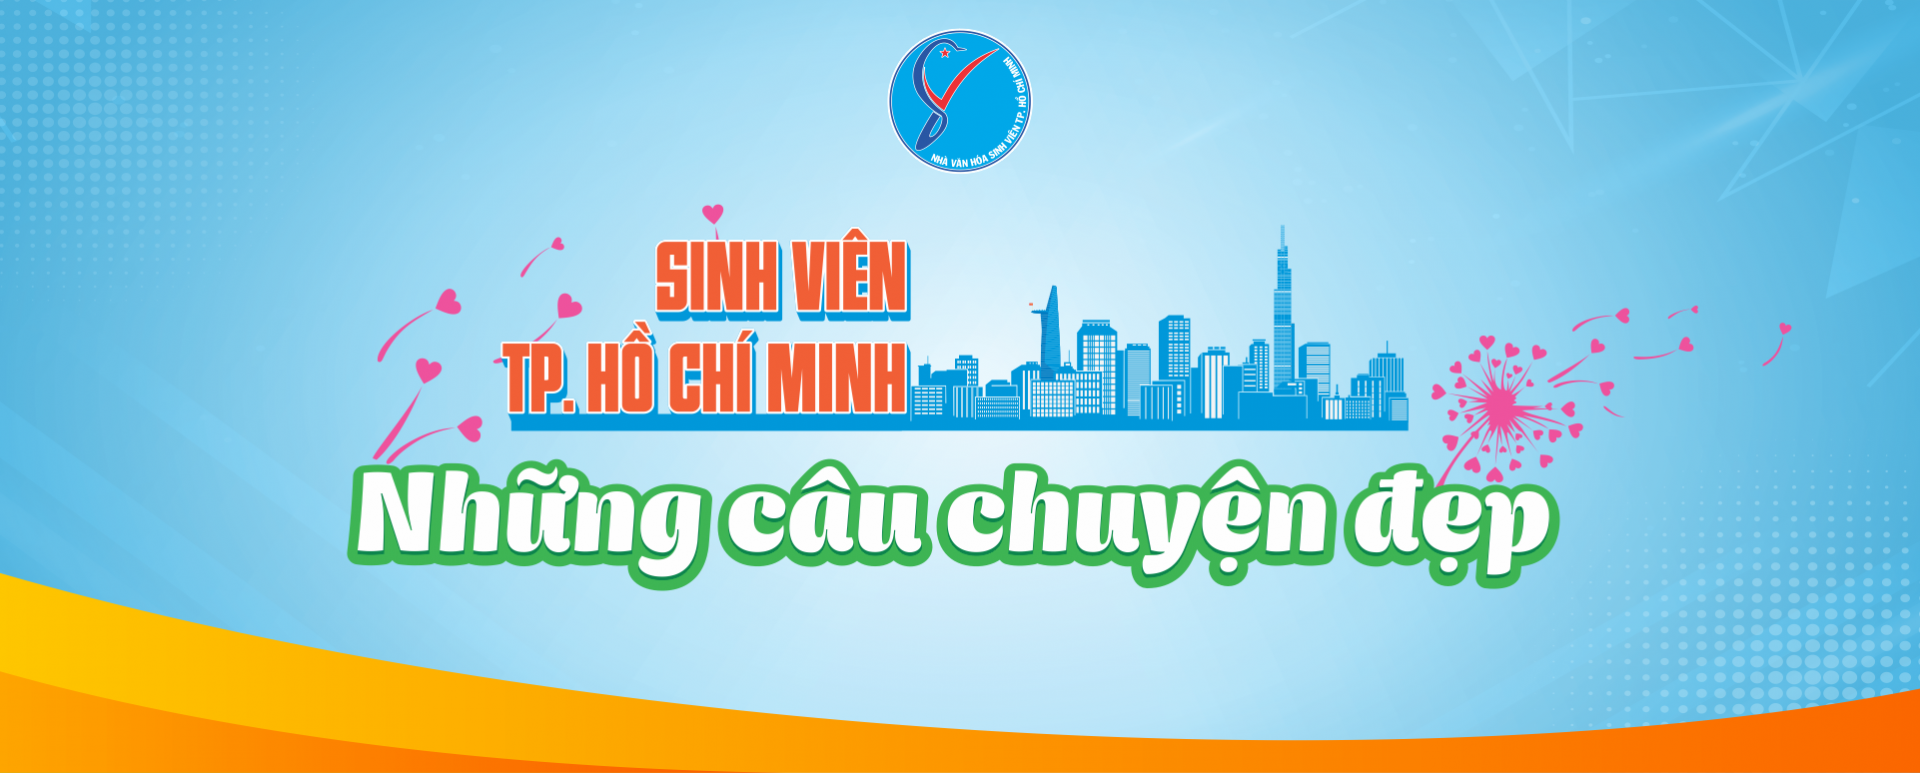 COVER-NHUNG-CAU-CHUYEN-DEP